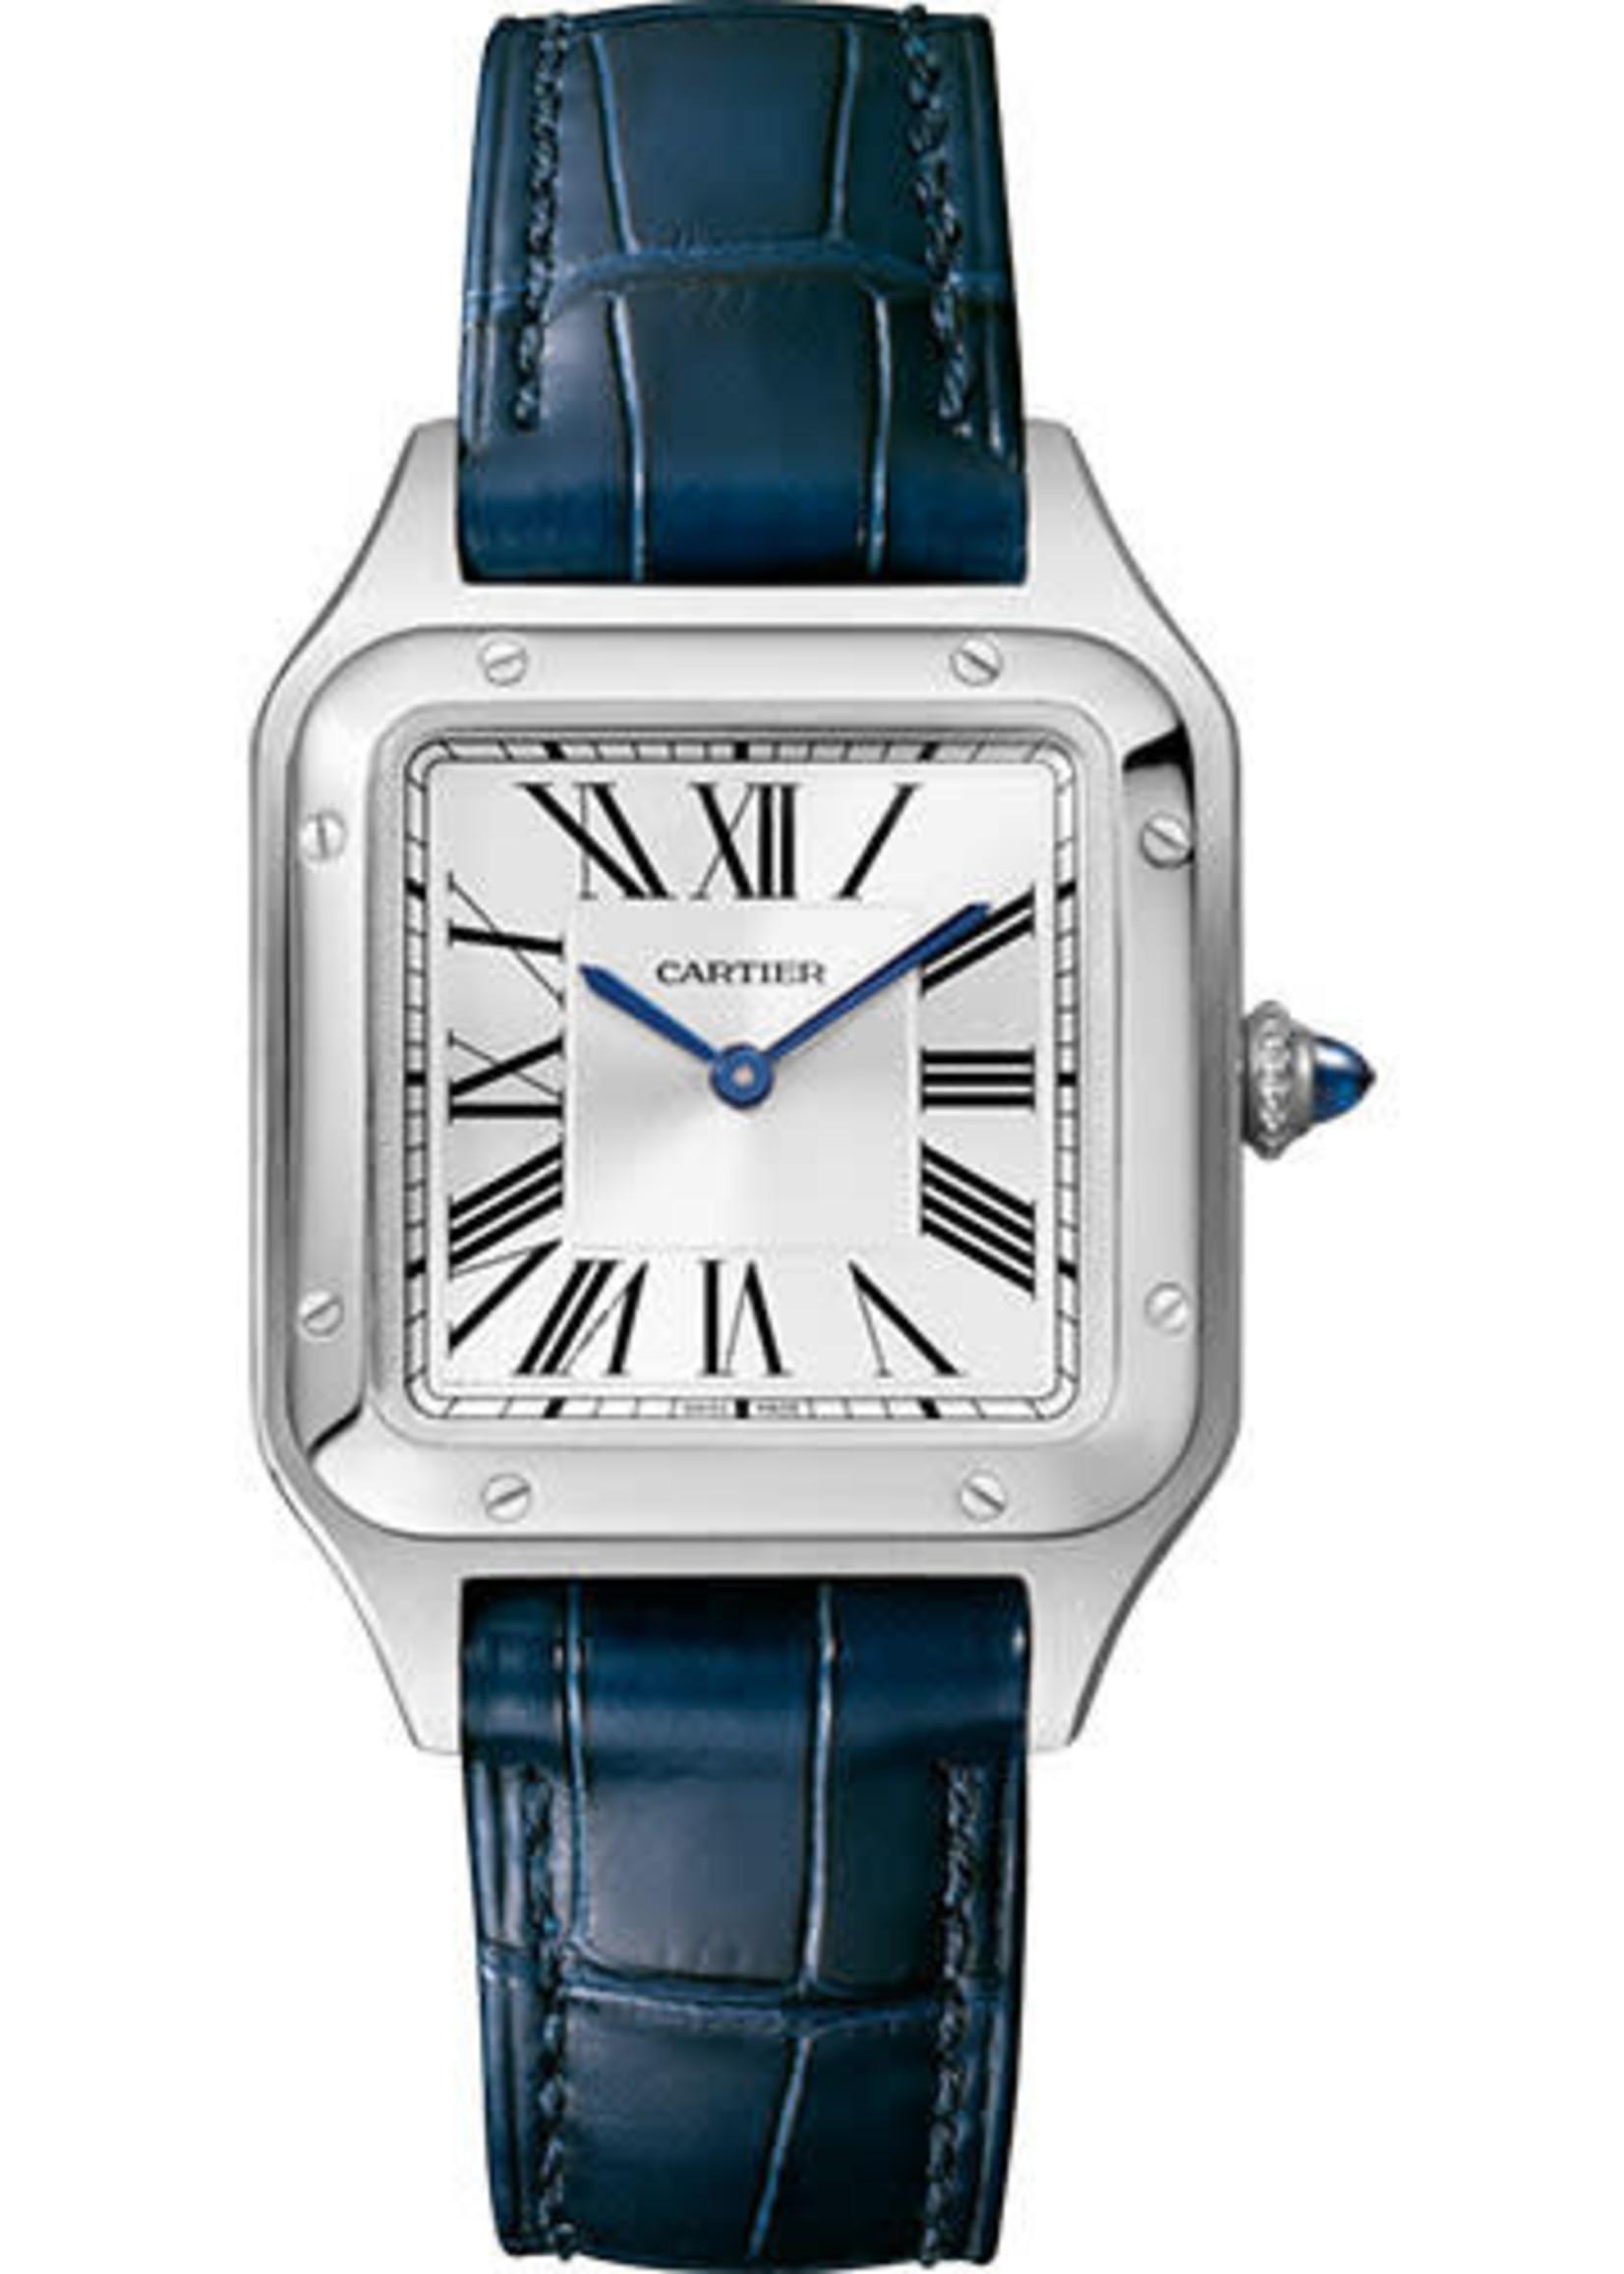 Cartier CARTIER SANTOS 38MM (2021 B+P) #419867